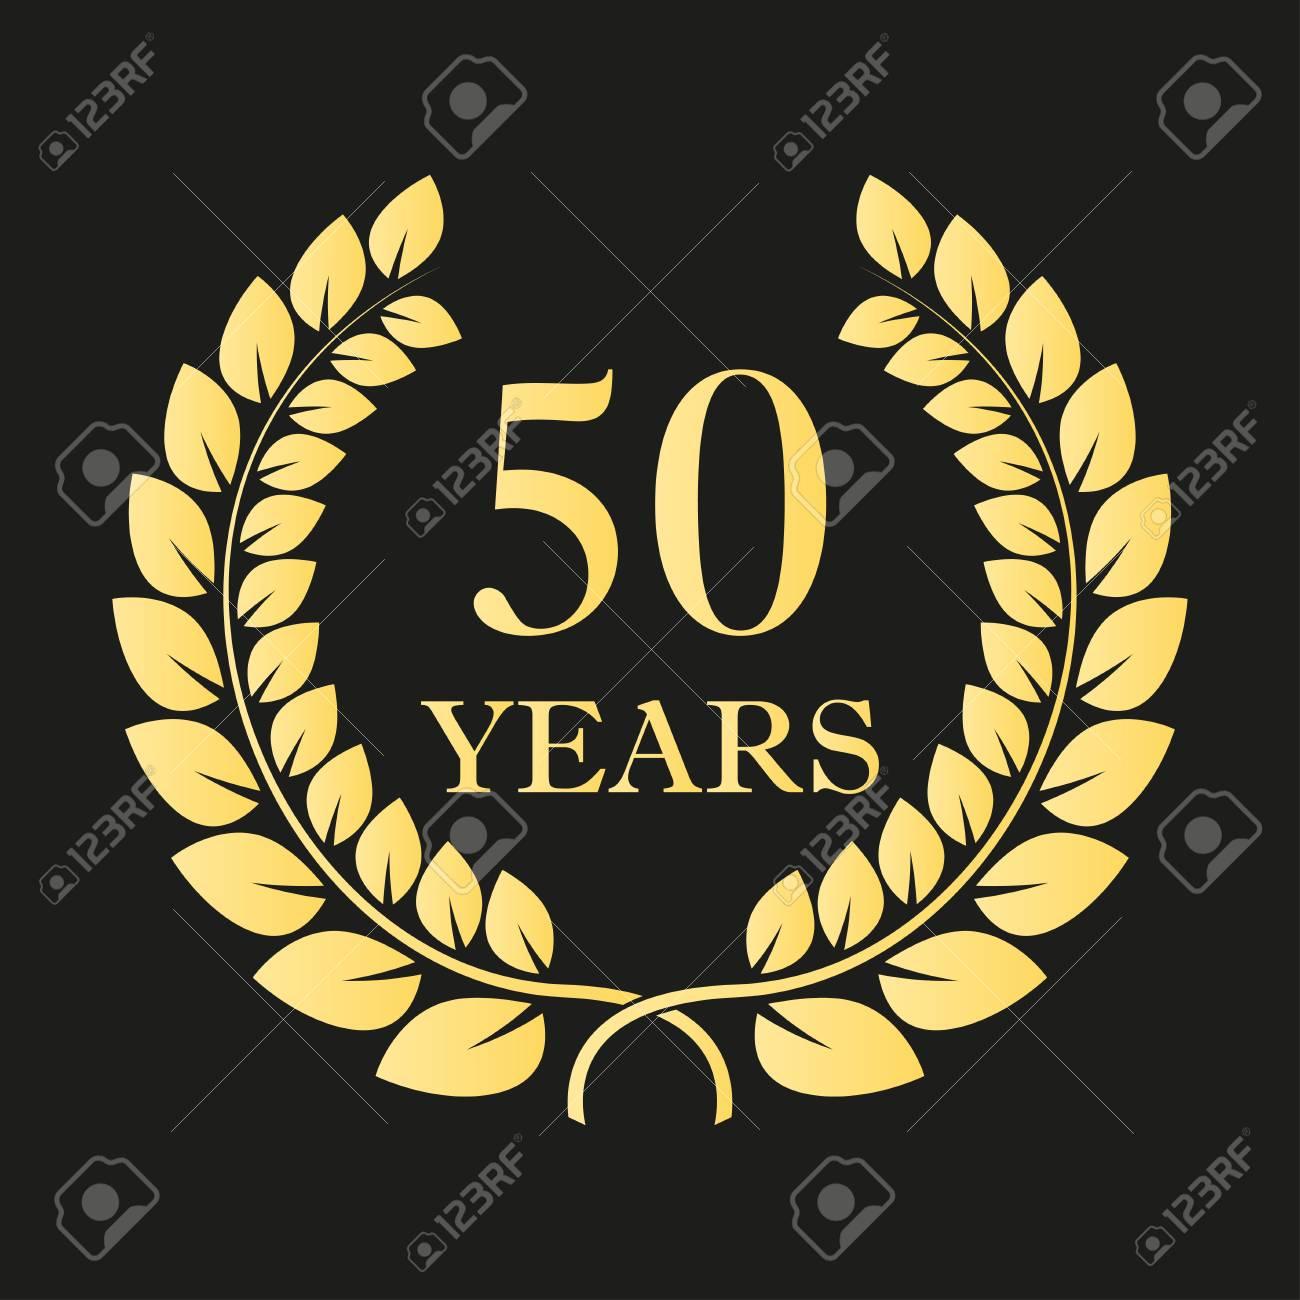 50 years anniversary laurel wreath icon or sign template for 50 years anniversary laurel wreath icon or sign template for celebration and congratulation design biocorpaavc Choice Image